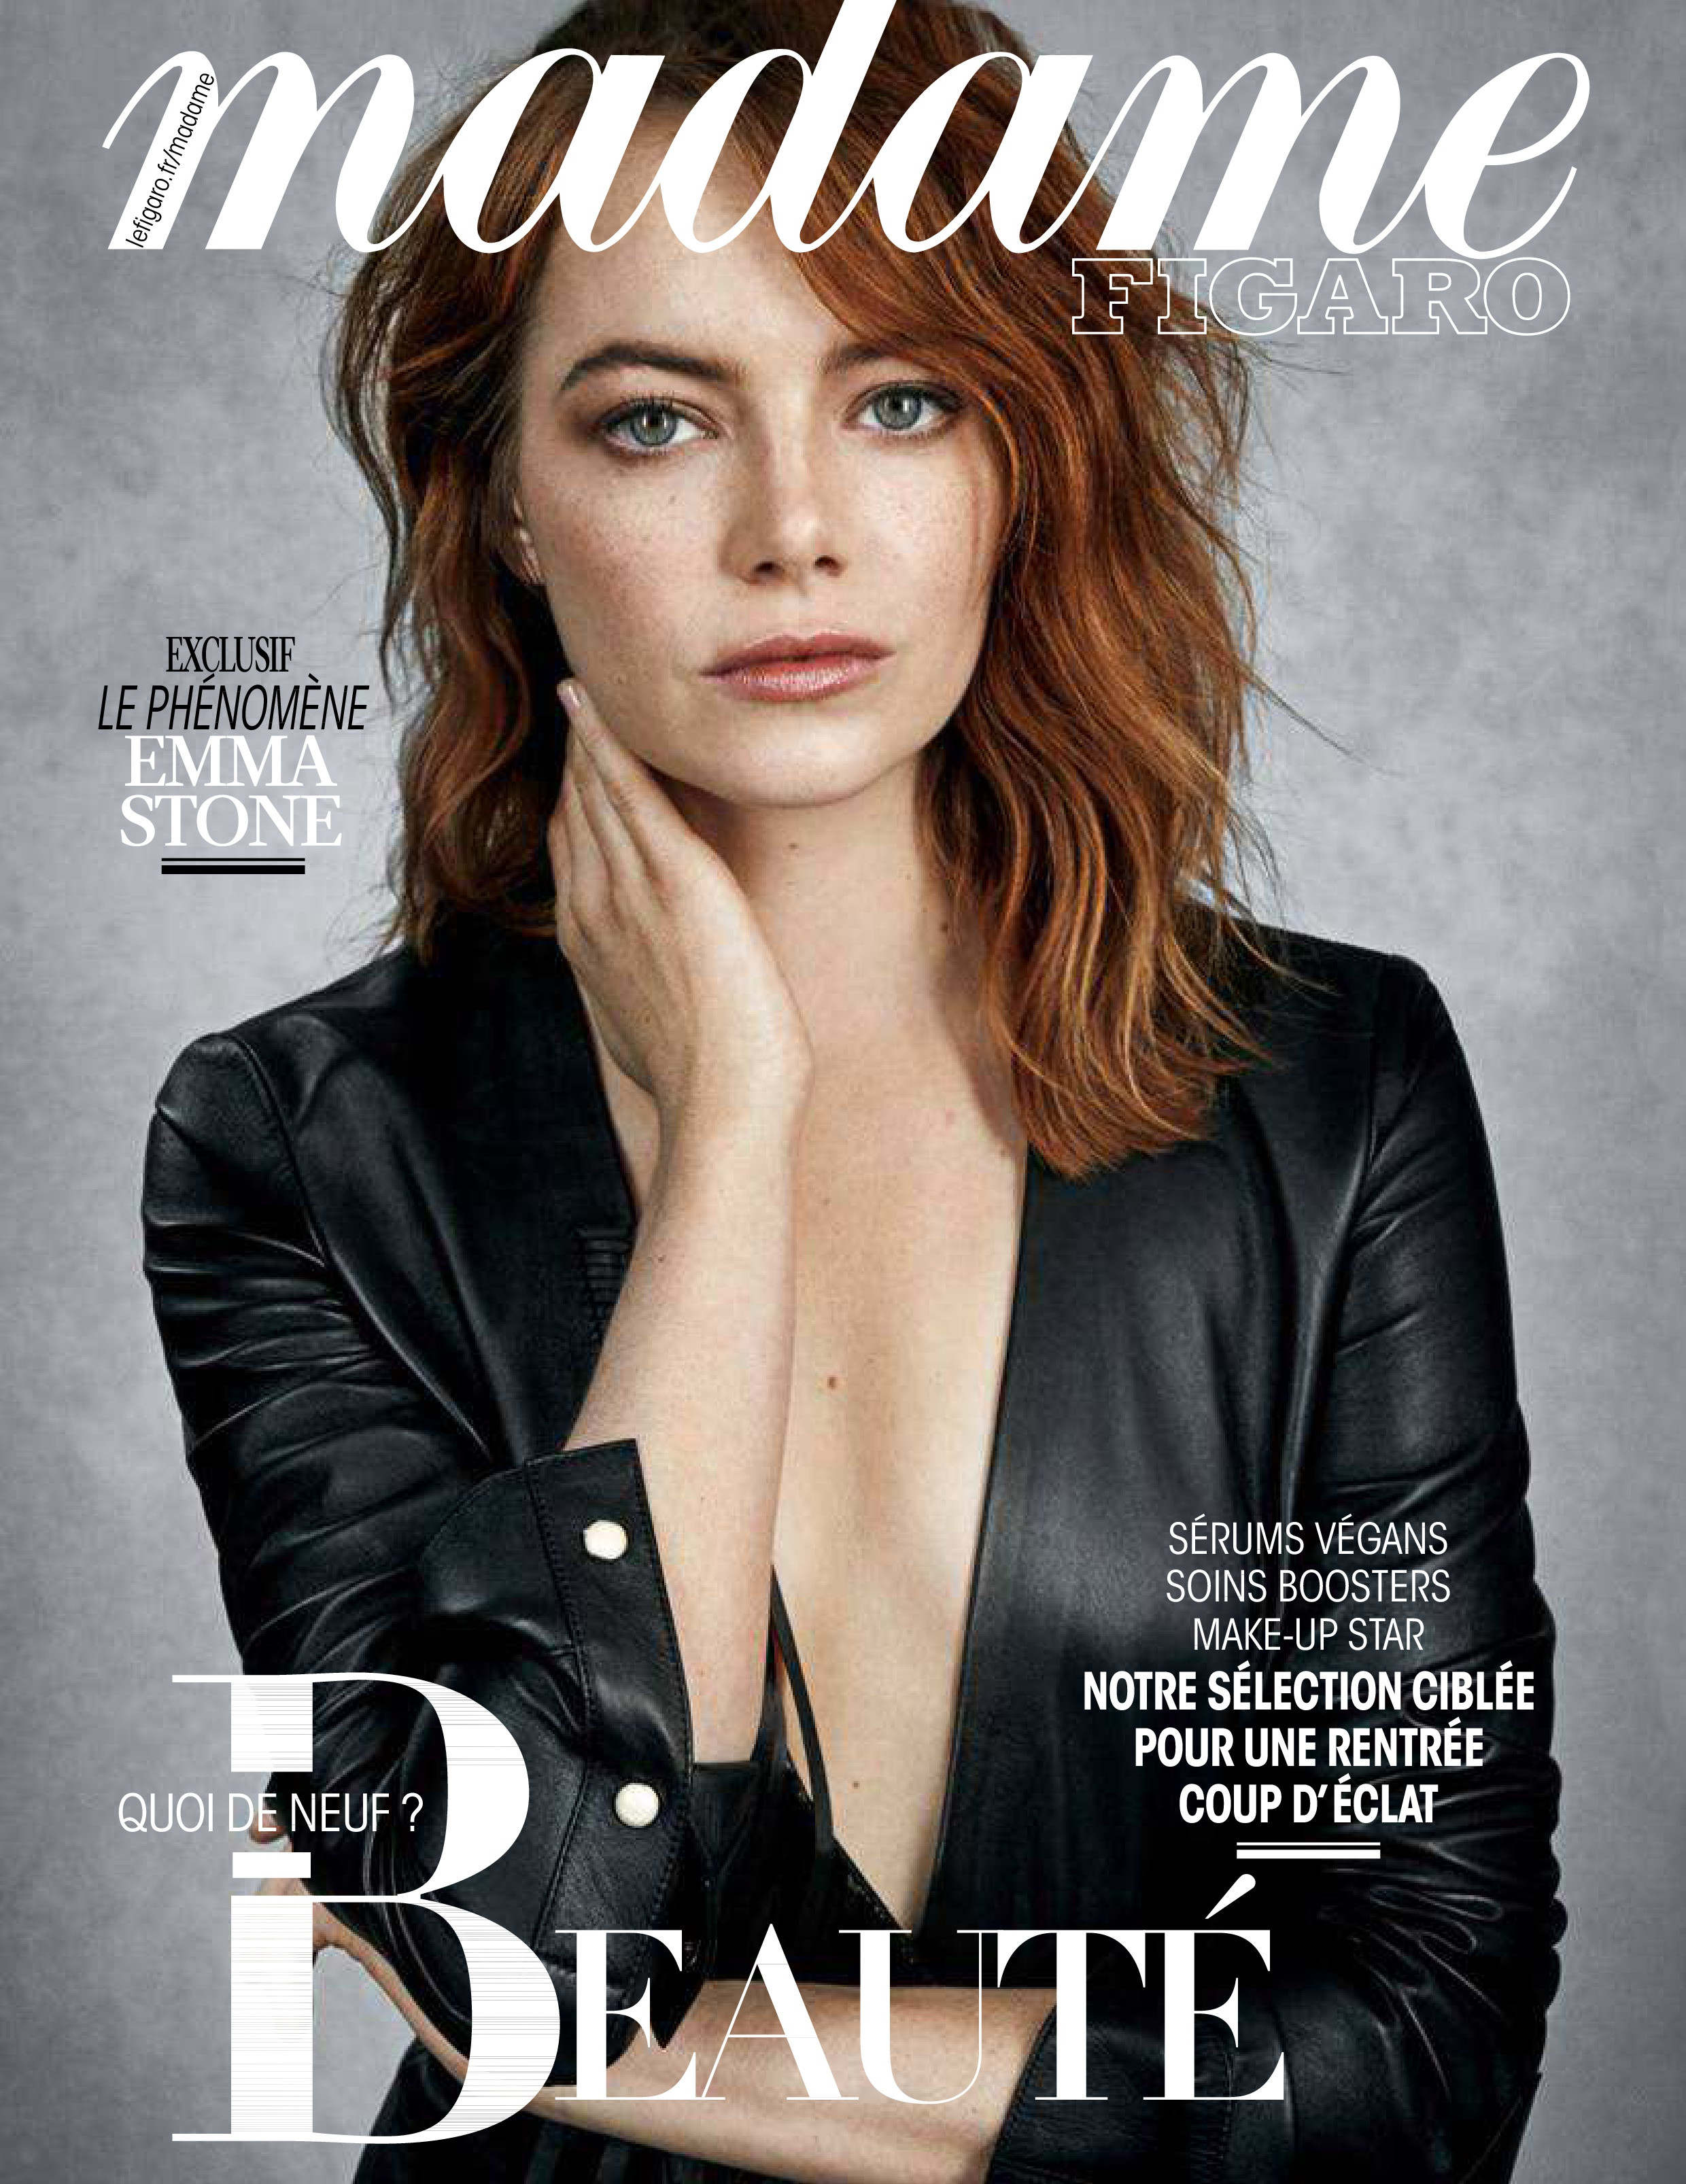 Emma Stone - Madame Figaro Magazine Pictures - Sexy Actress Pictures | Hot Actress Pictures - ActressSnaps.com